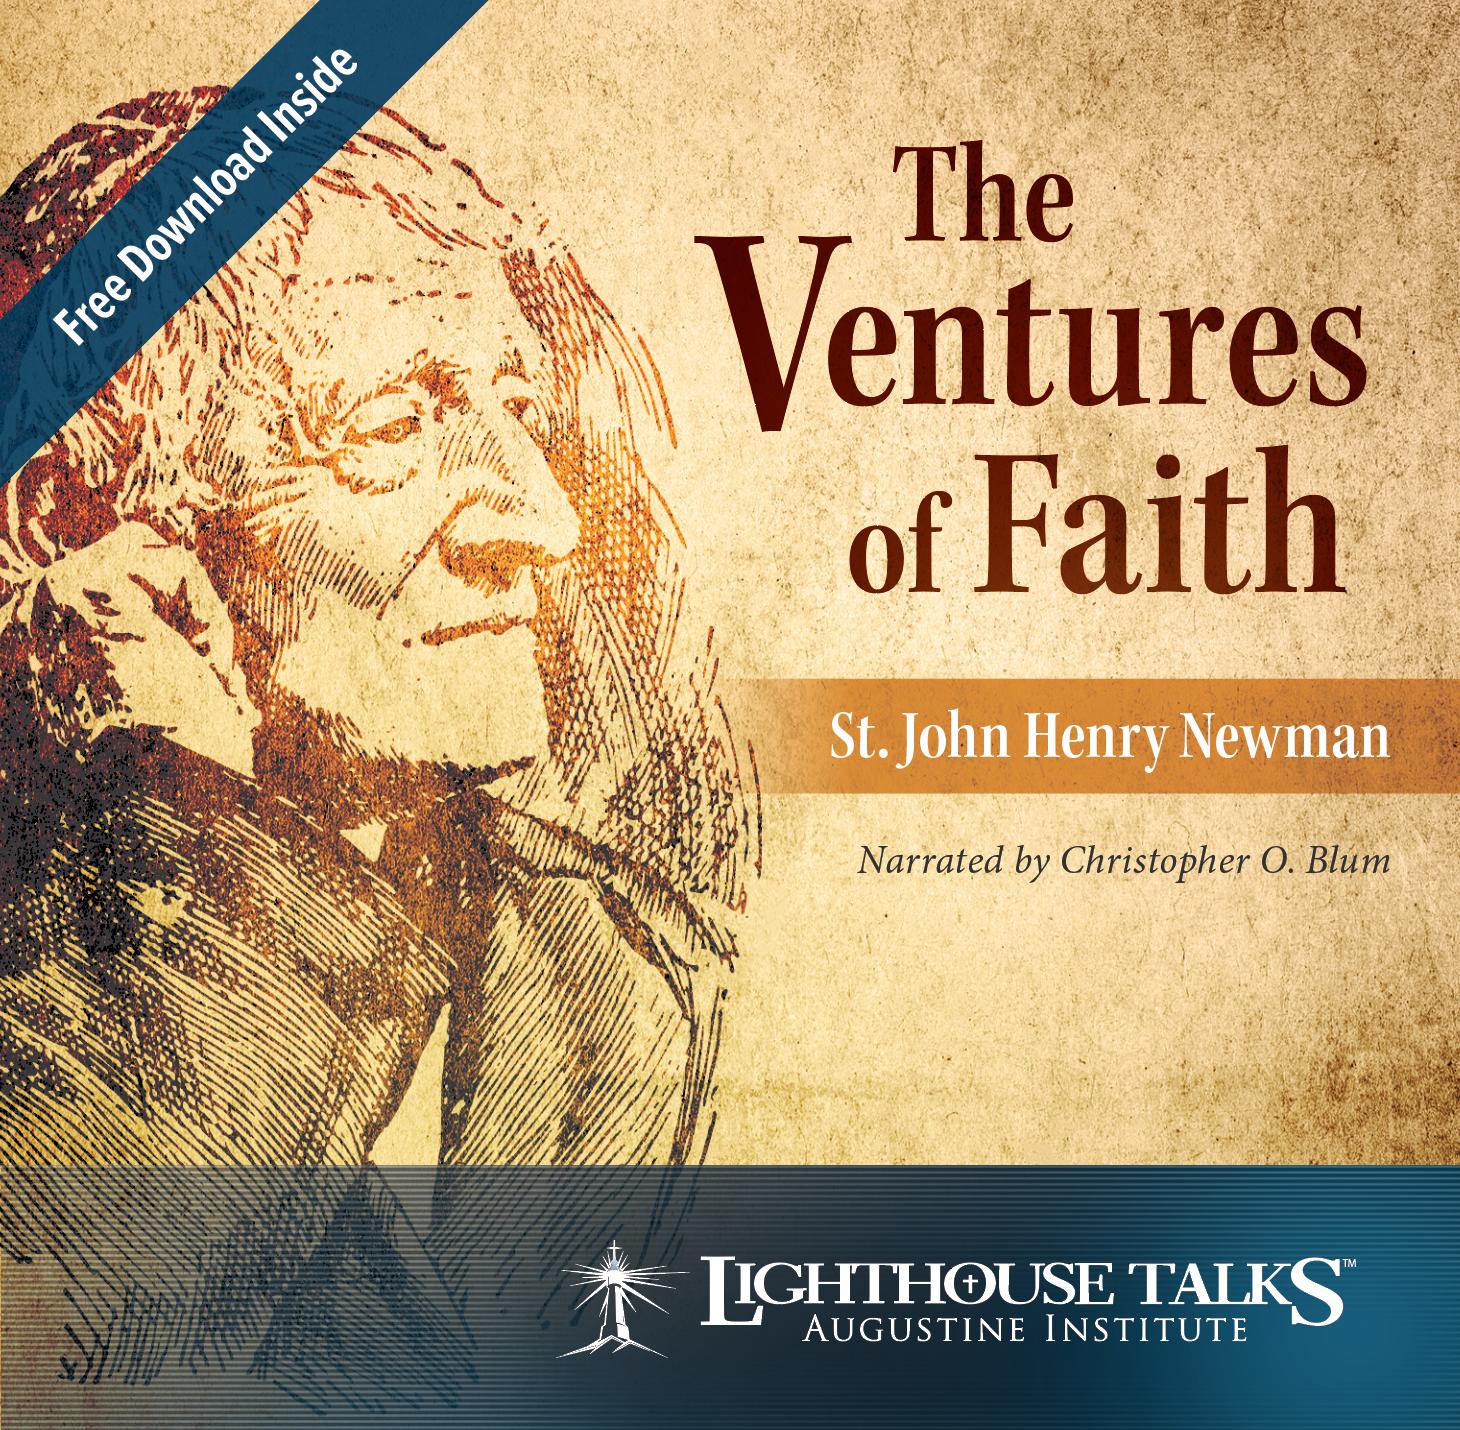 The Ventures of Faith: St. John Henry Newman - Dr. Christopher Blum